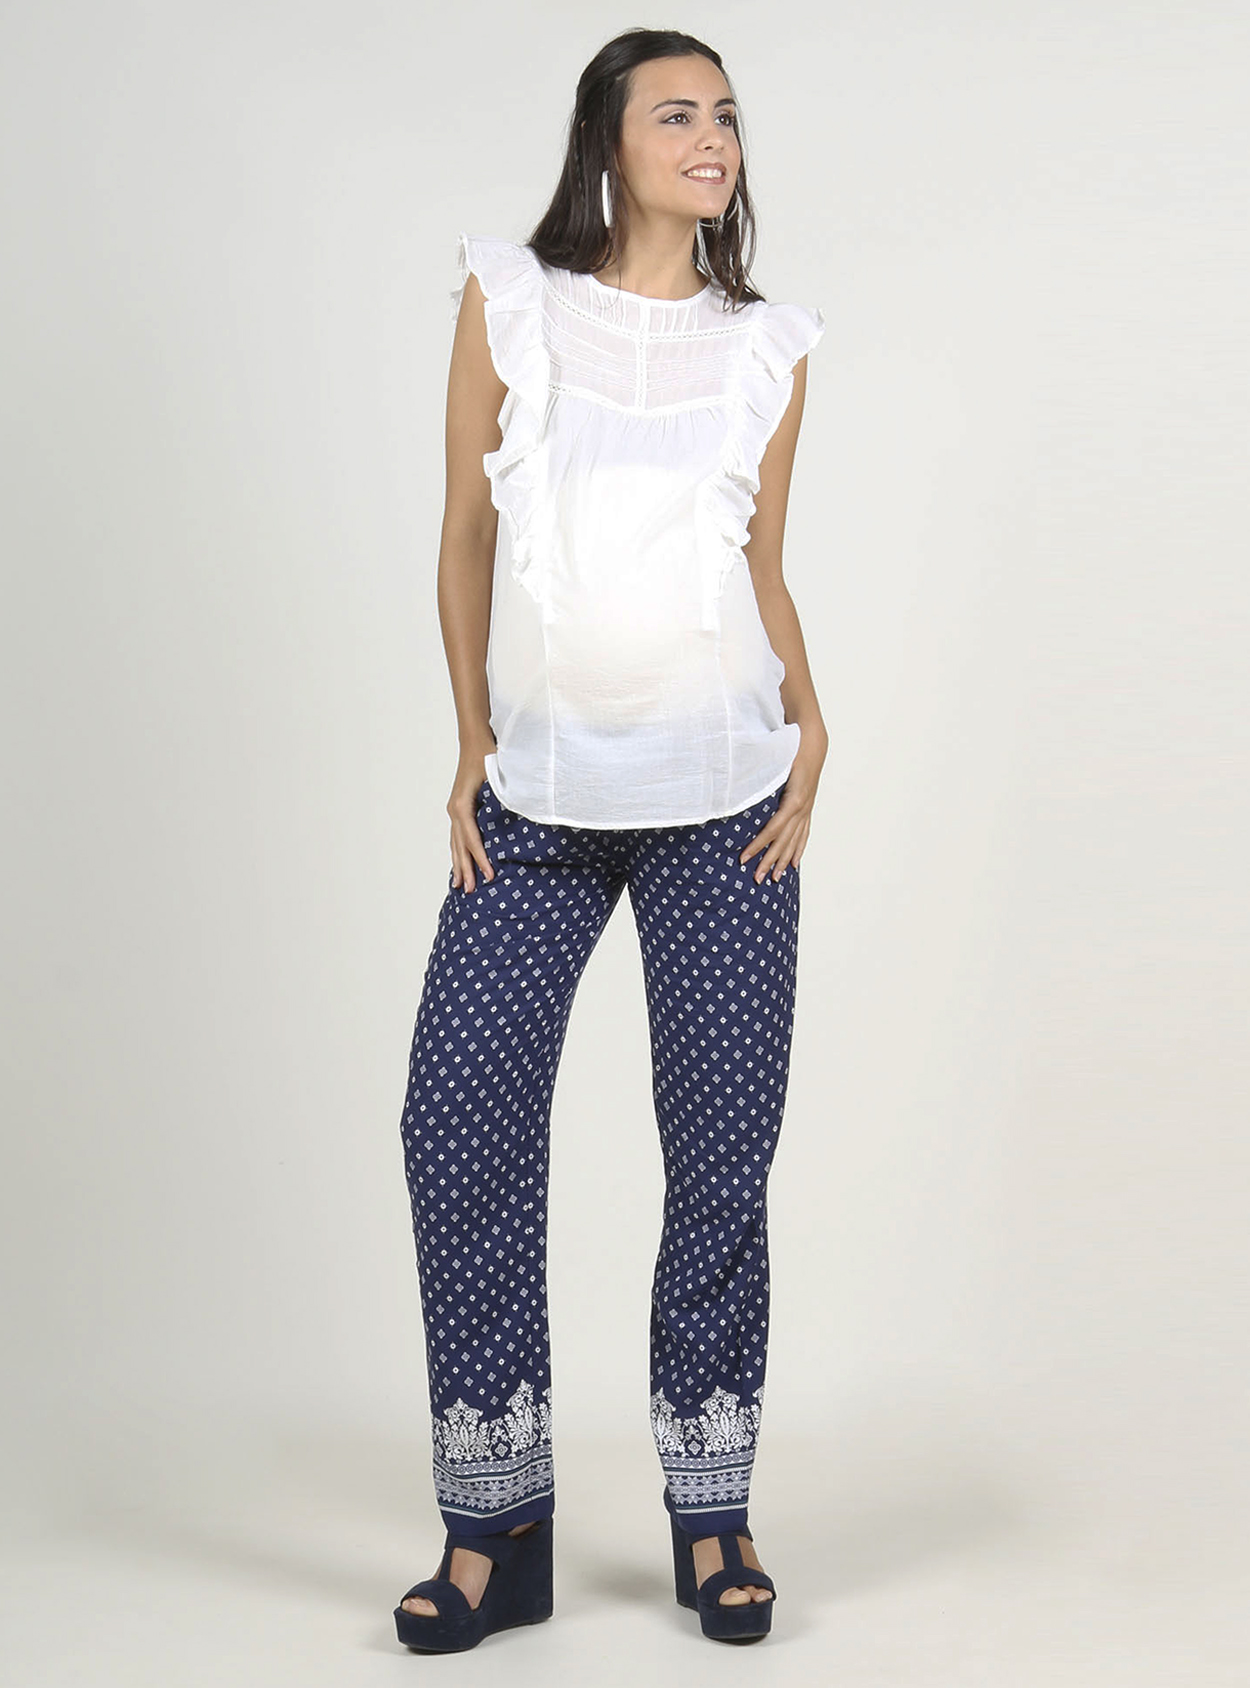 Pantalon ancho estampado con smock